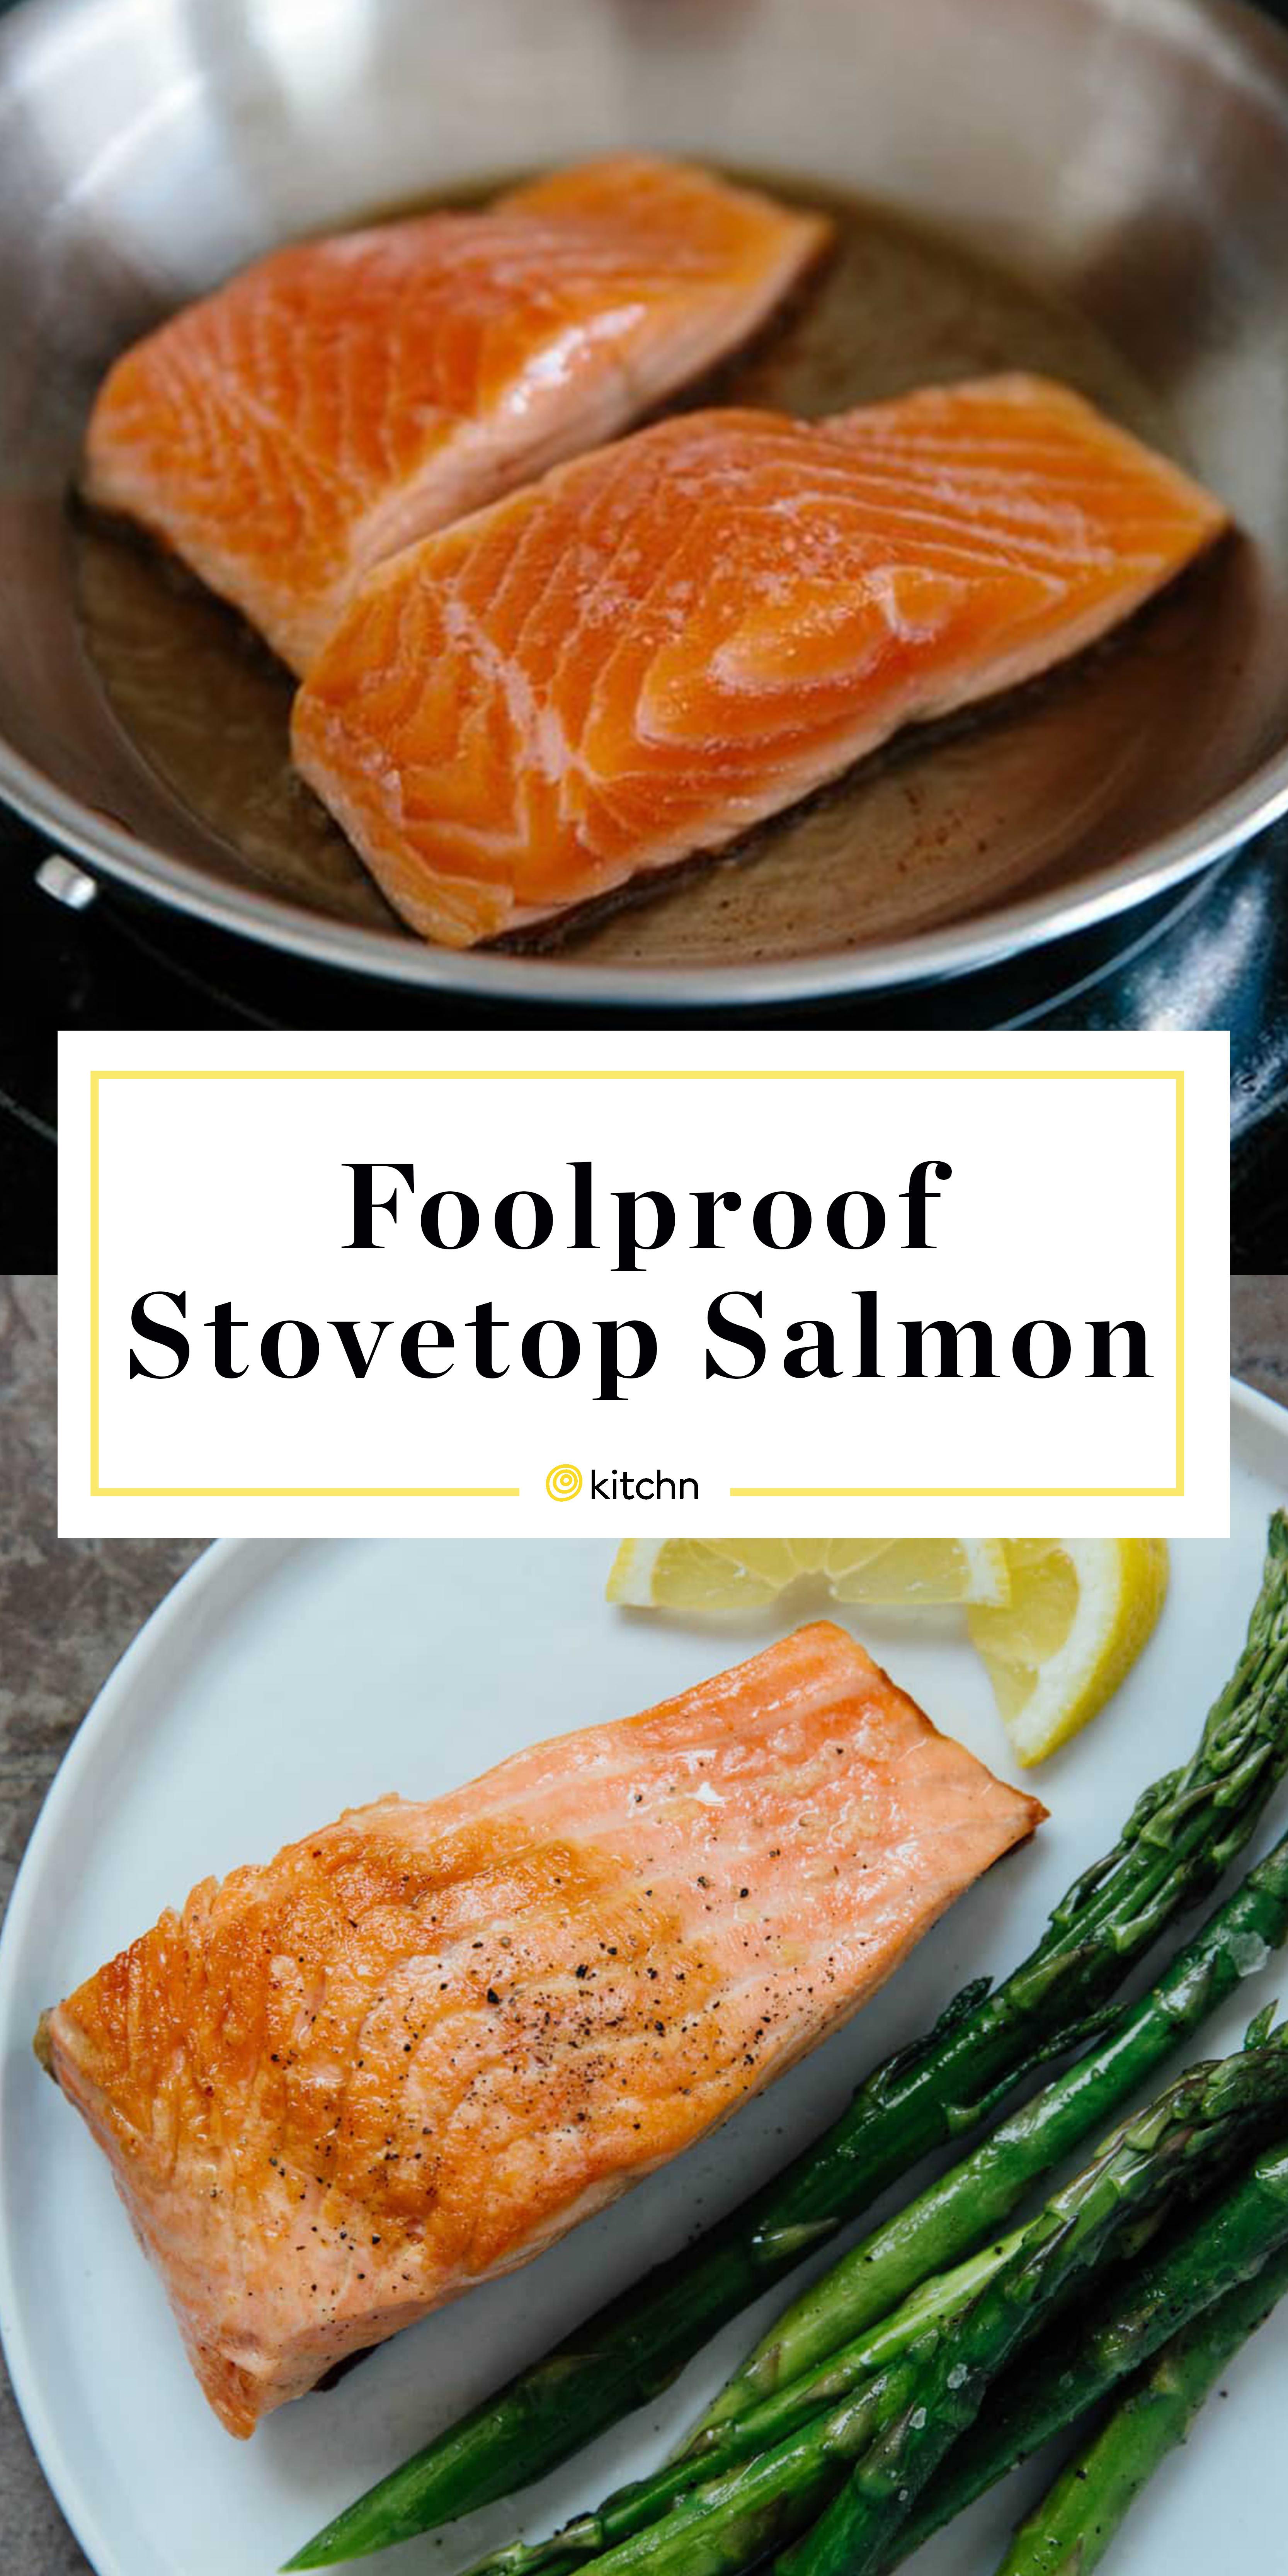 How To Cook Pan-Seared Salmon